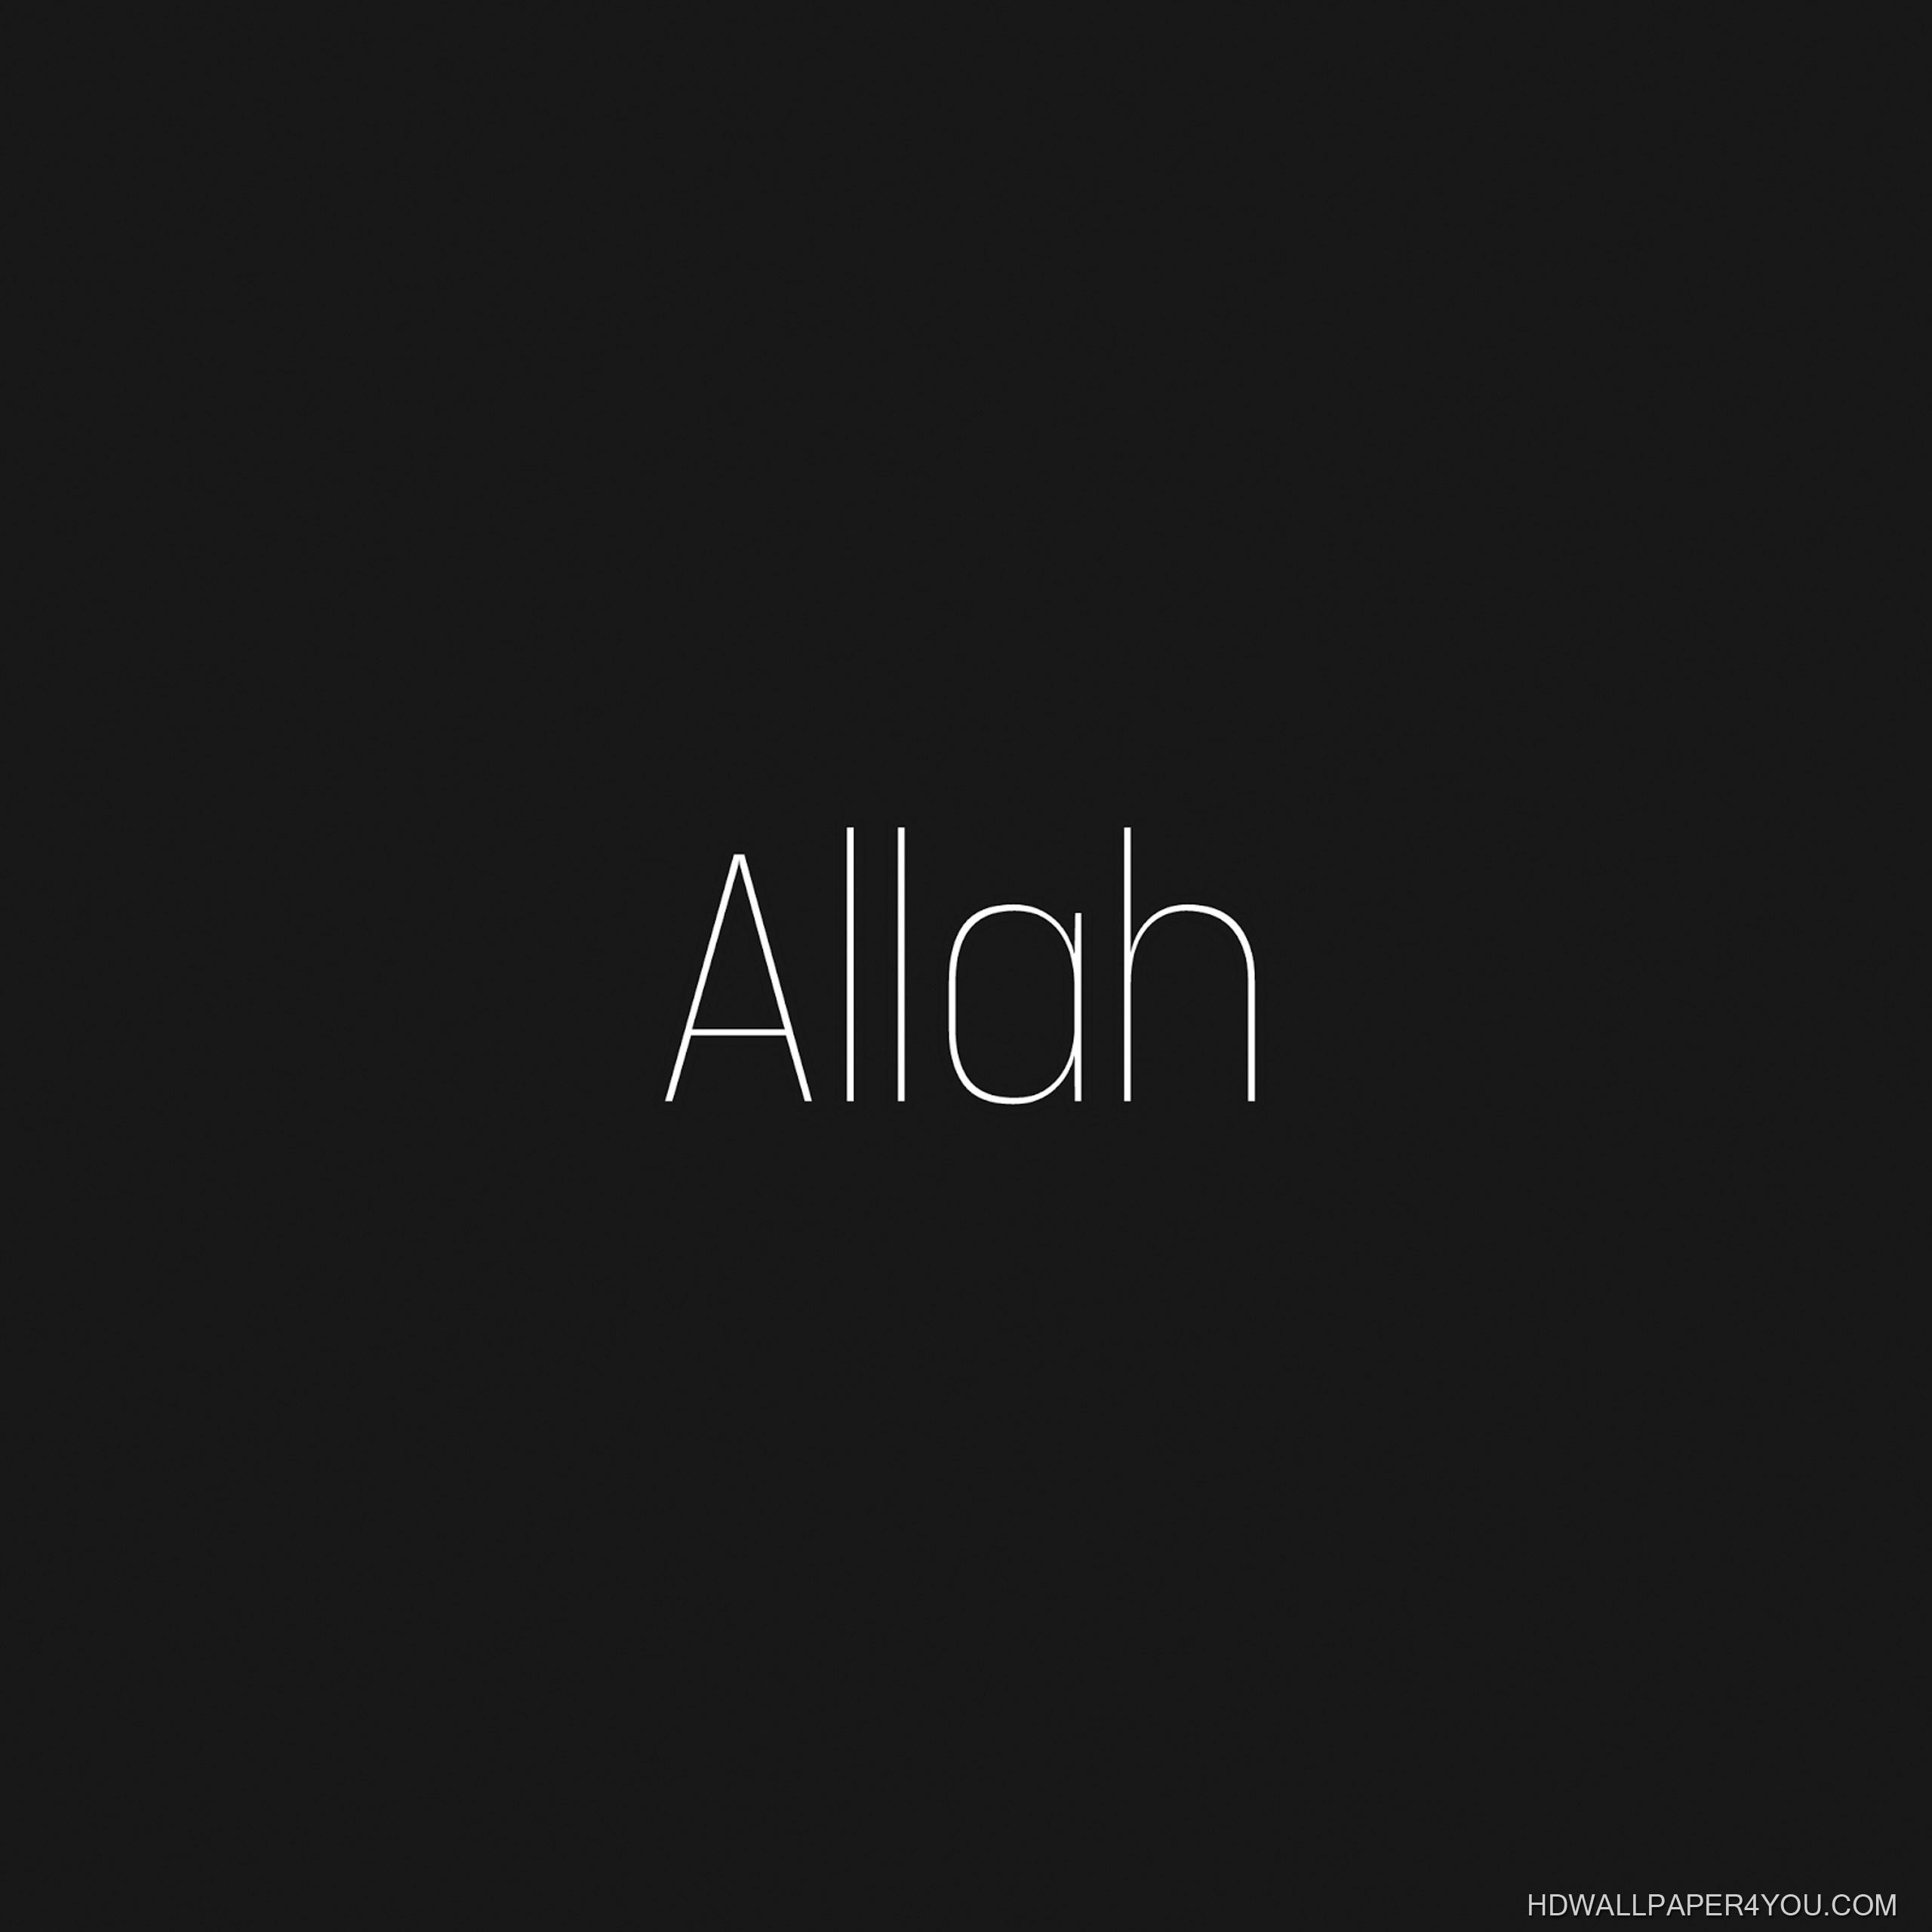 Best Wallpapers For Iphone 6 Hd صور إسلامية خلفيات أسود Islamic Wallpapers Allah صور